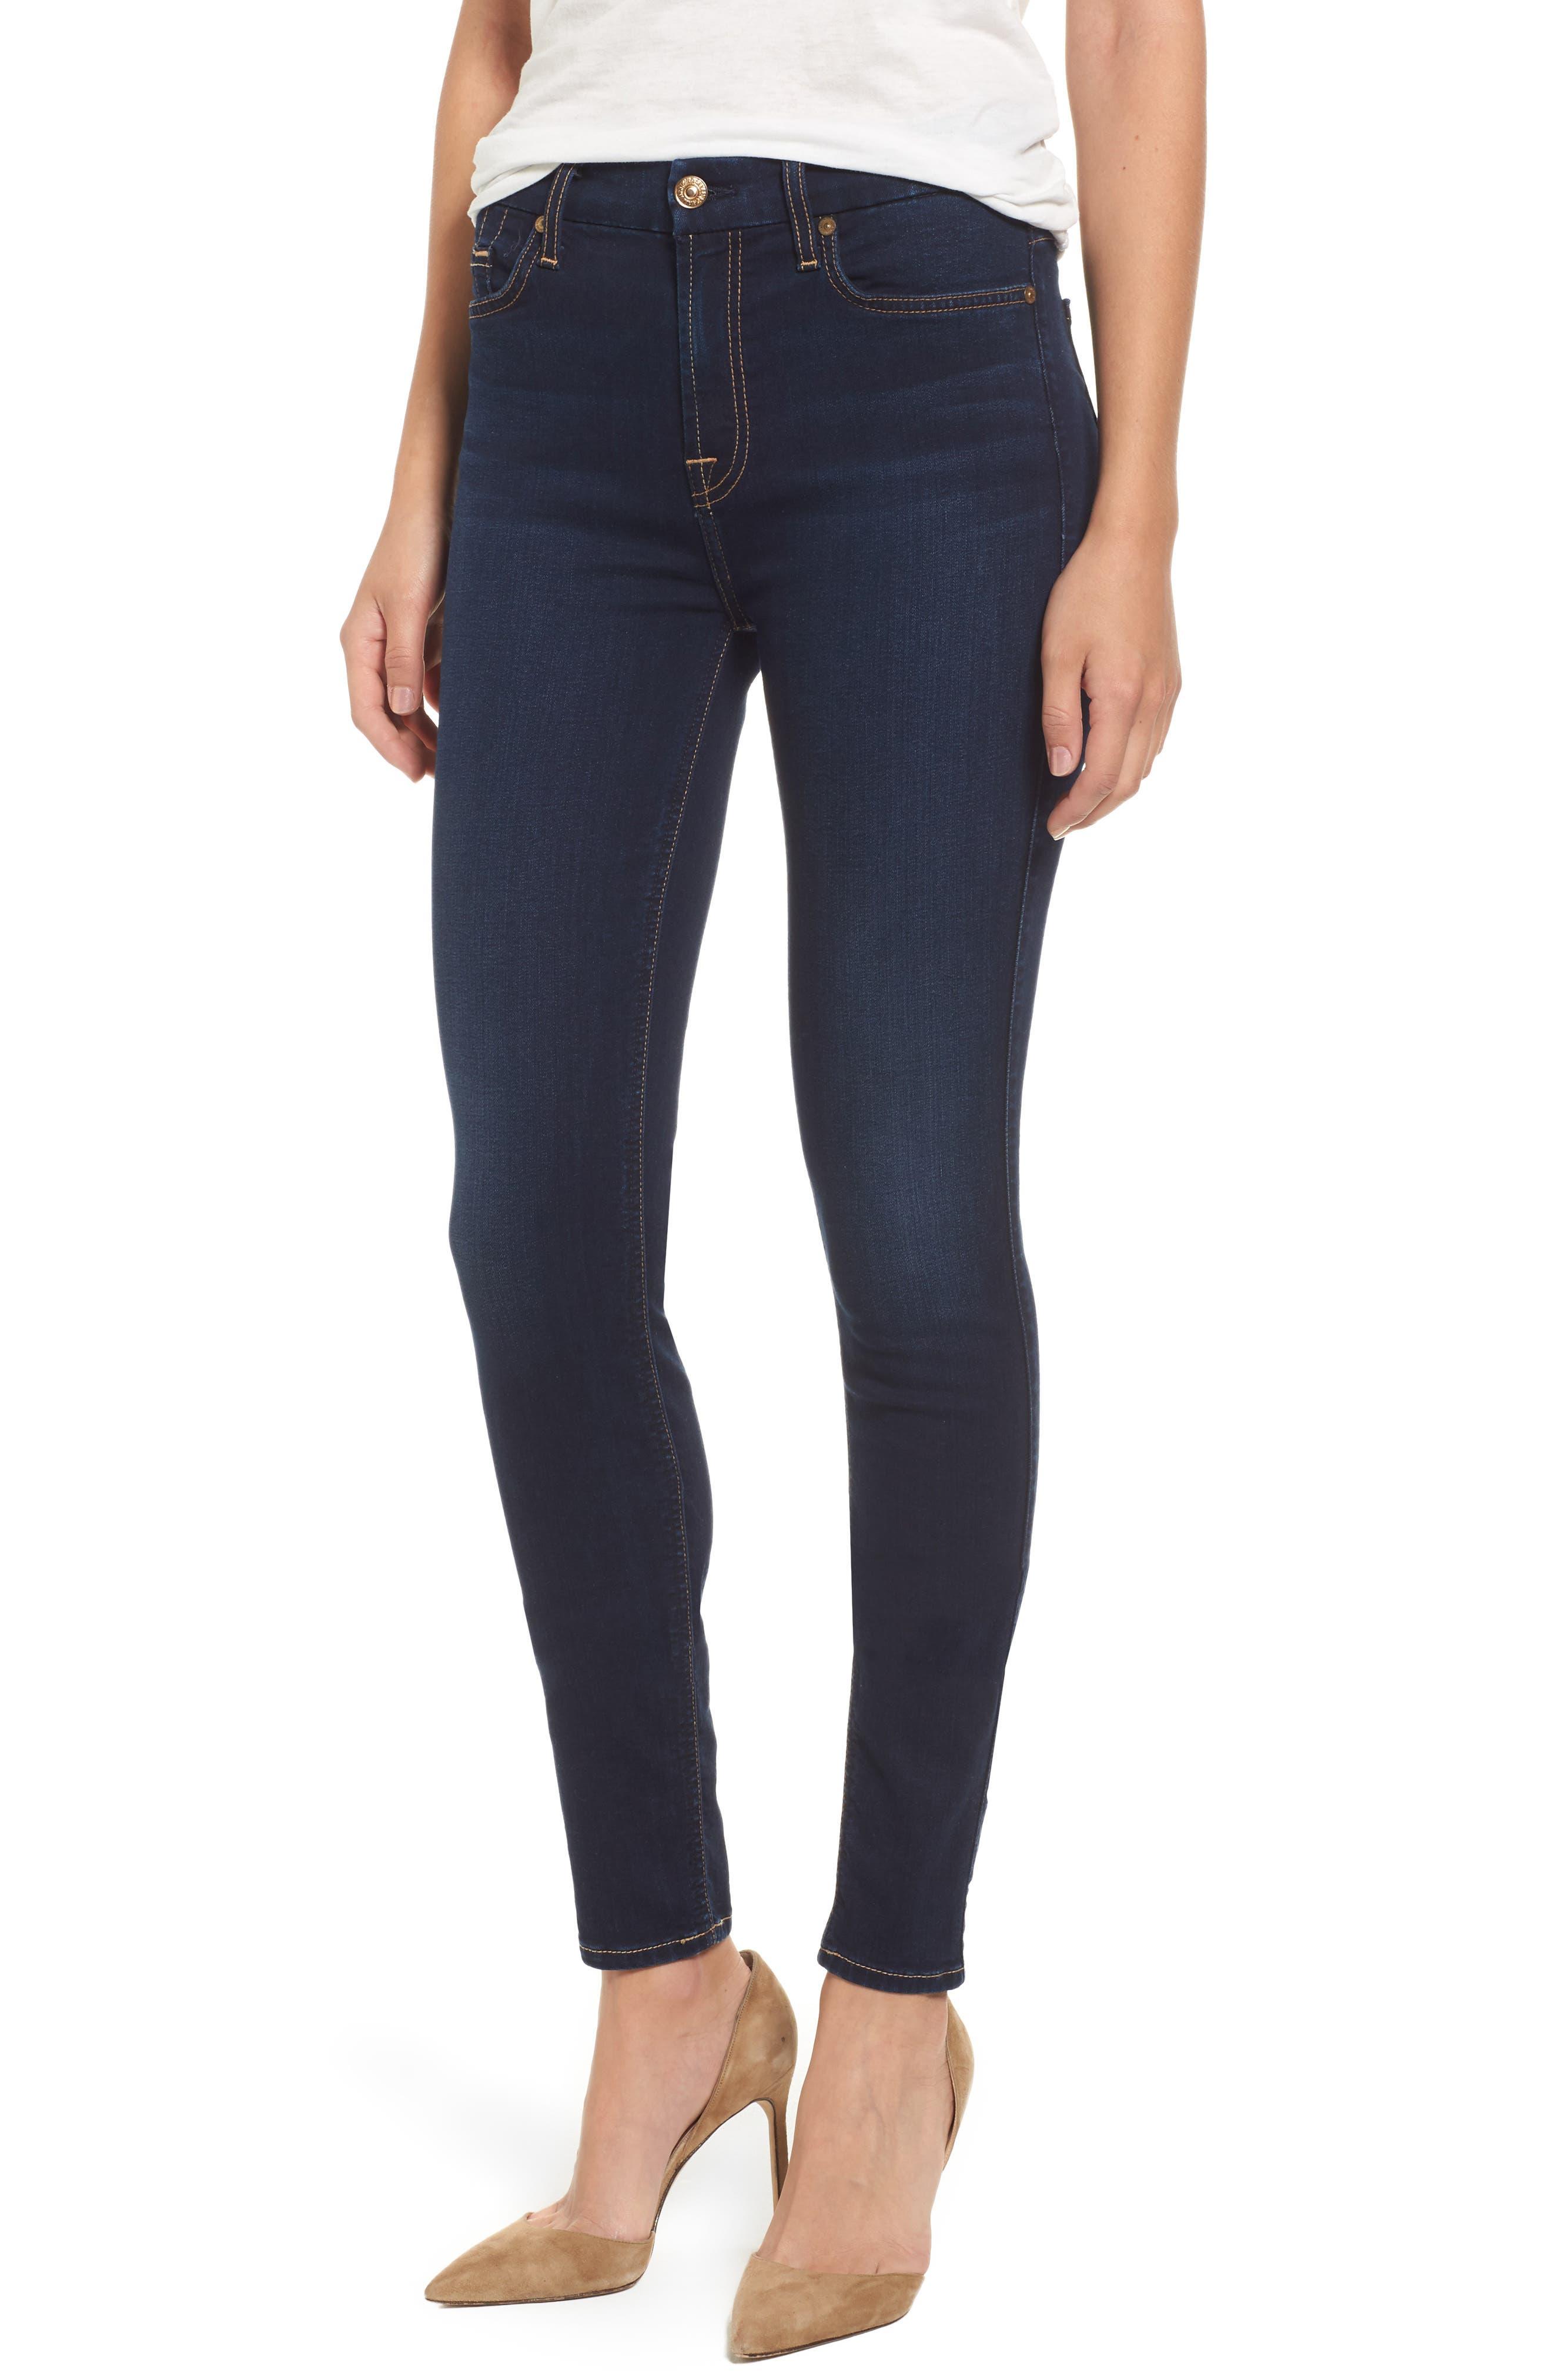 b(air) High Waist Skinny Jeans,                             Main thumbnail 1, color,                             400